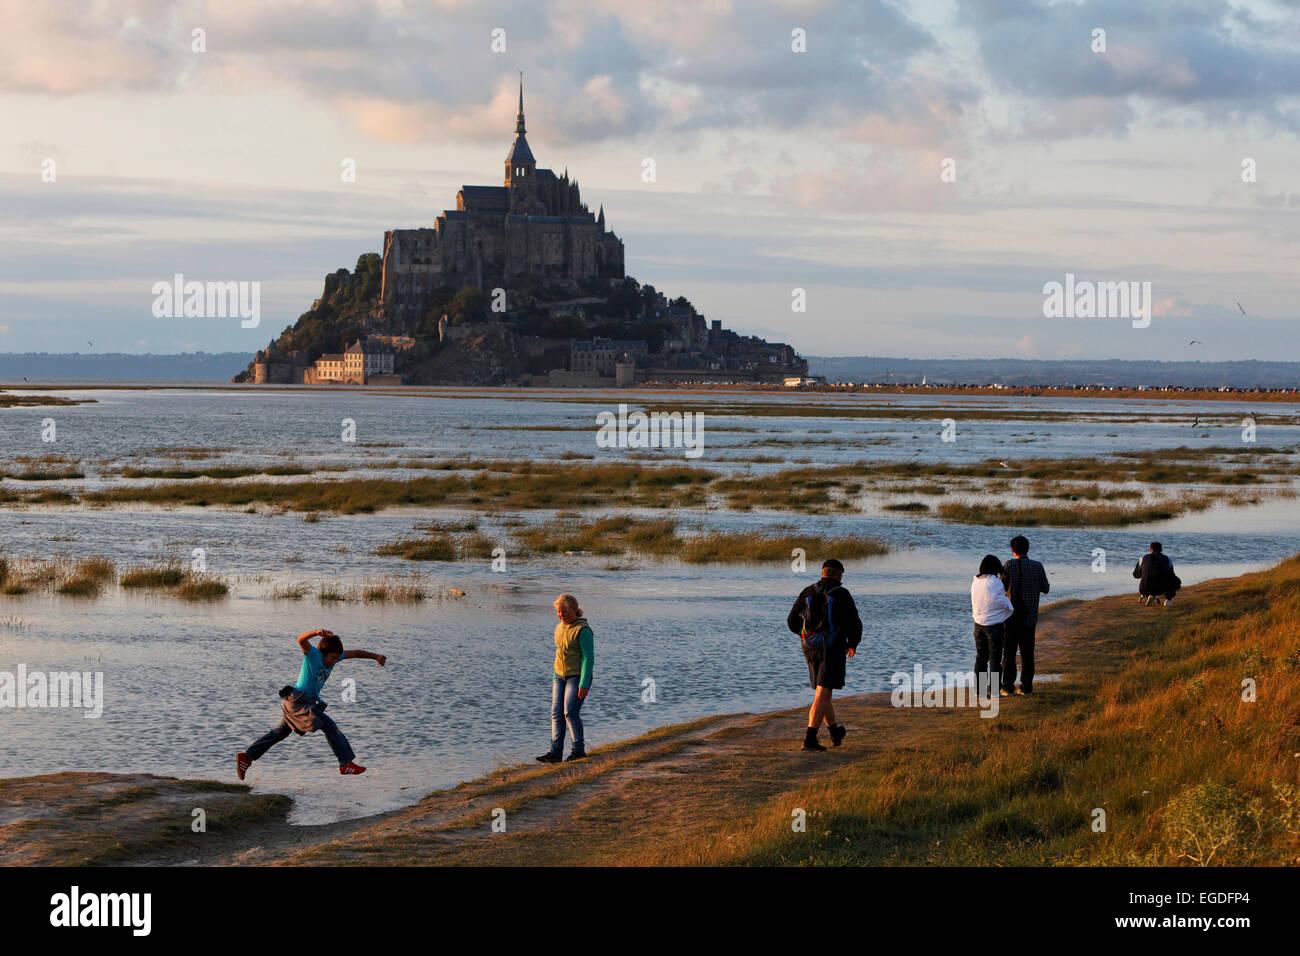 Mont Saint Michel, Lower Normandy, Normandy, France - Stock Image